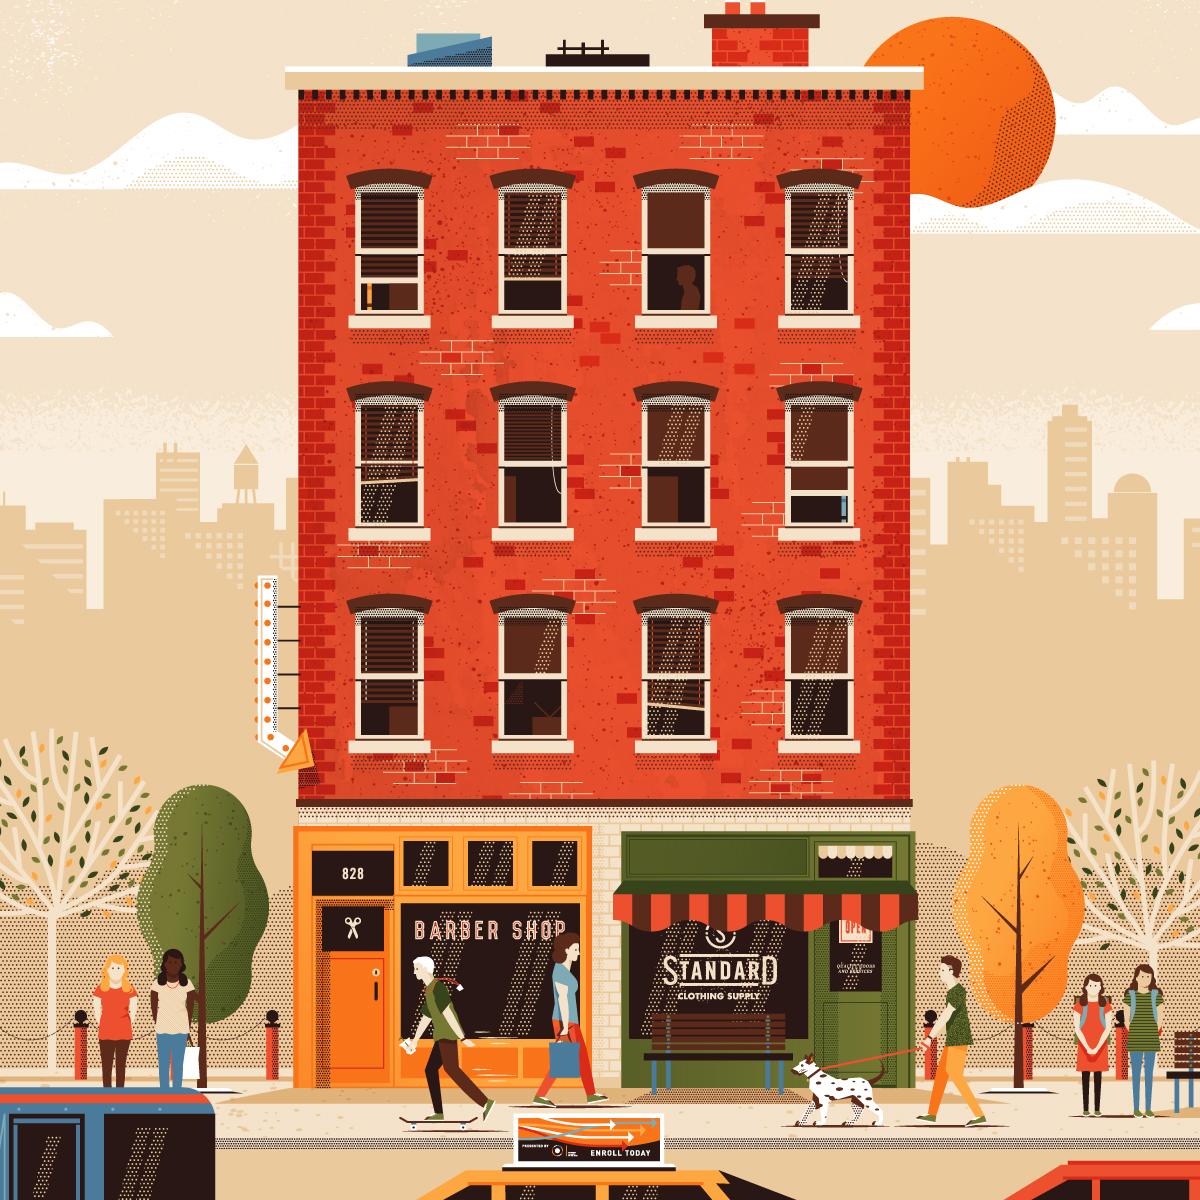 Street Life Plaid Mtn Illustration By Matthew Loren Carlson